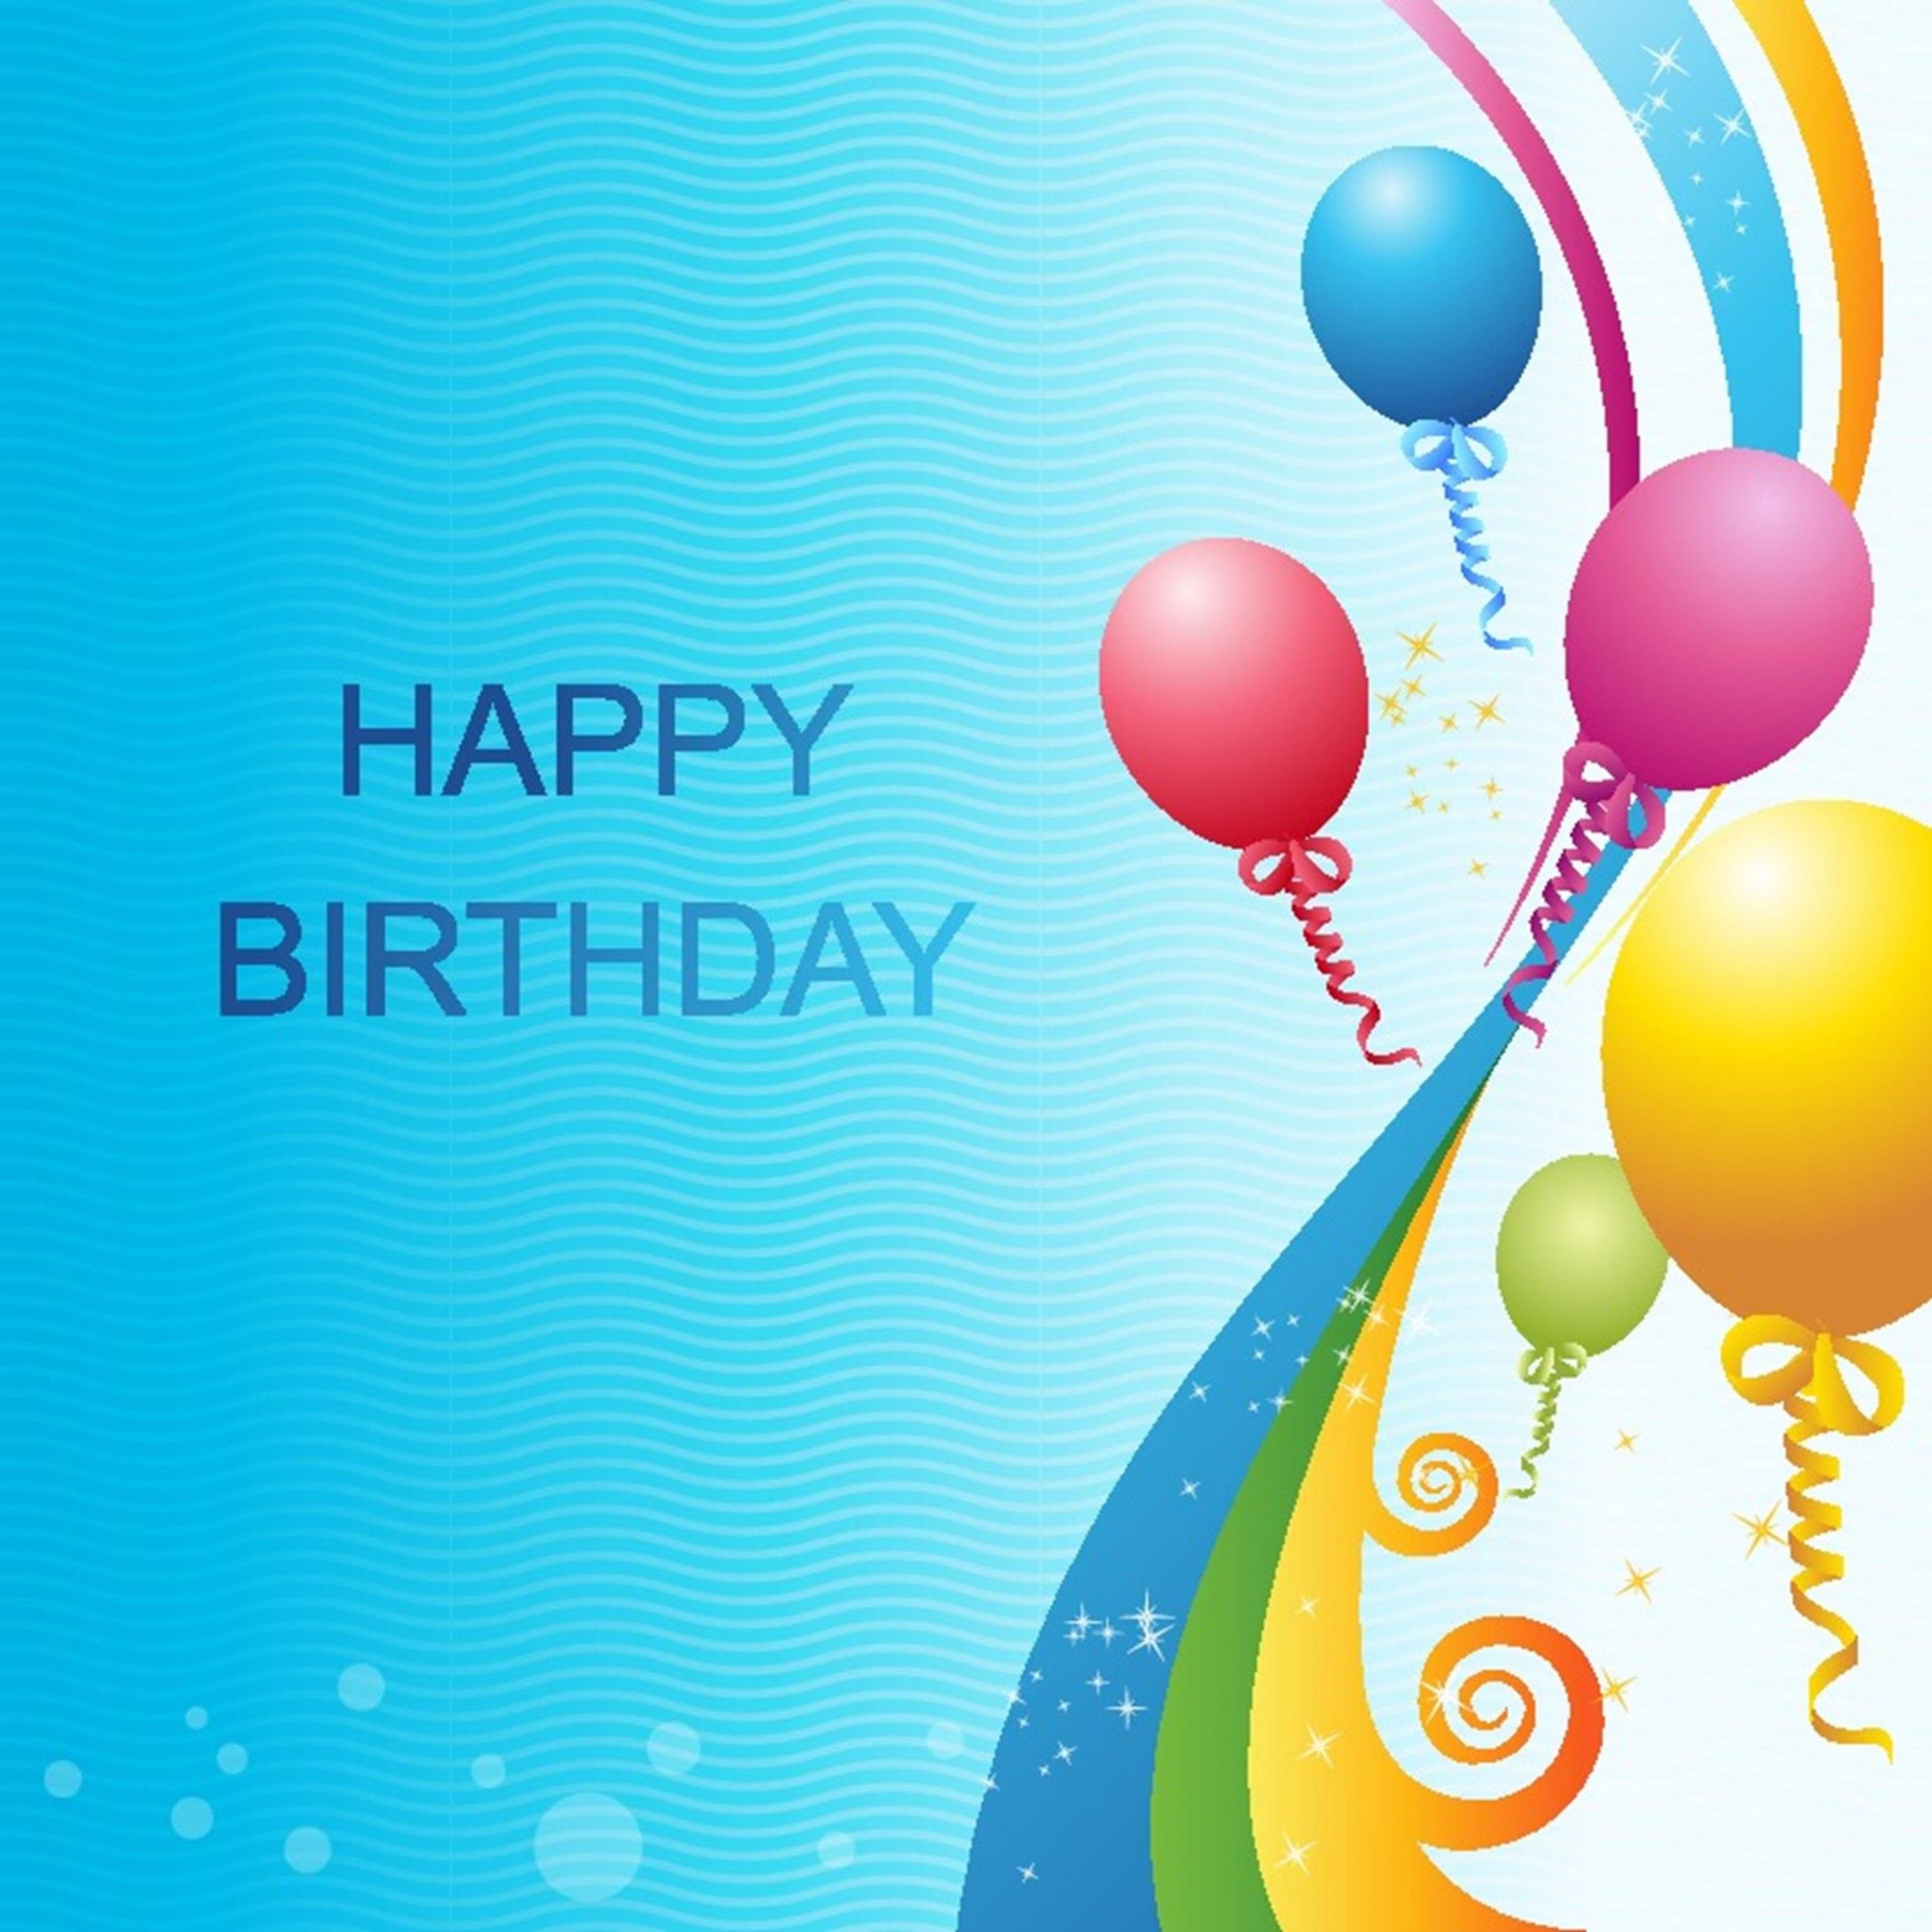 8 Best Free E Birthday Cards E Birthday Cards Free Birthday Card Template Free Free Birthday Card